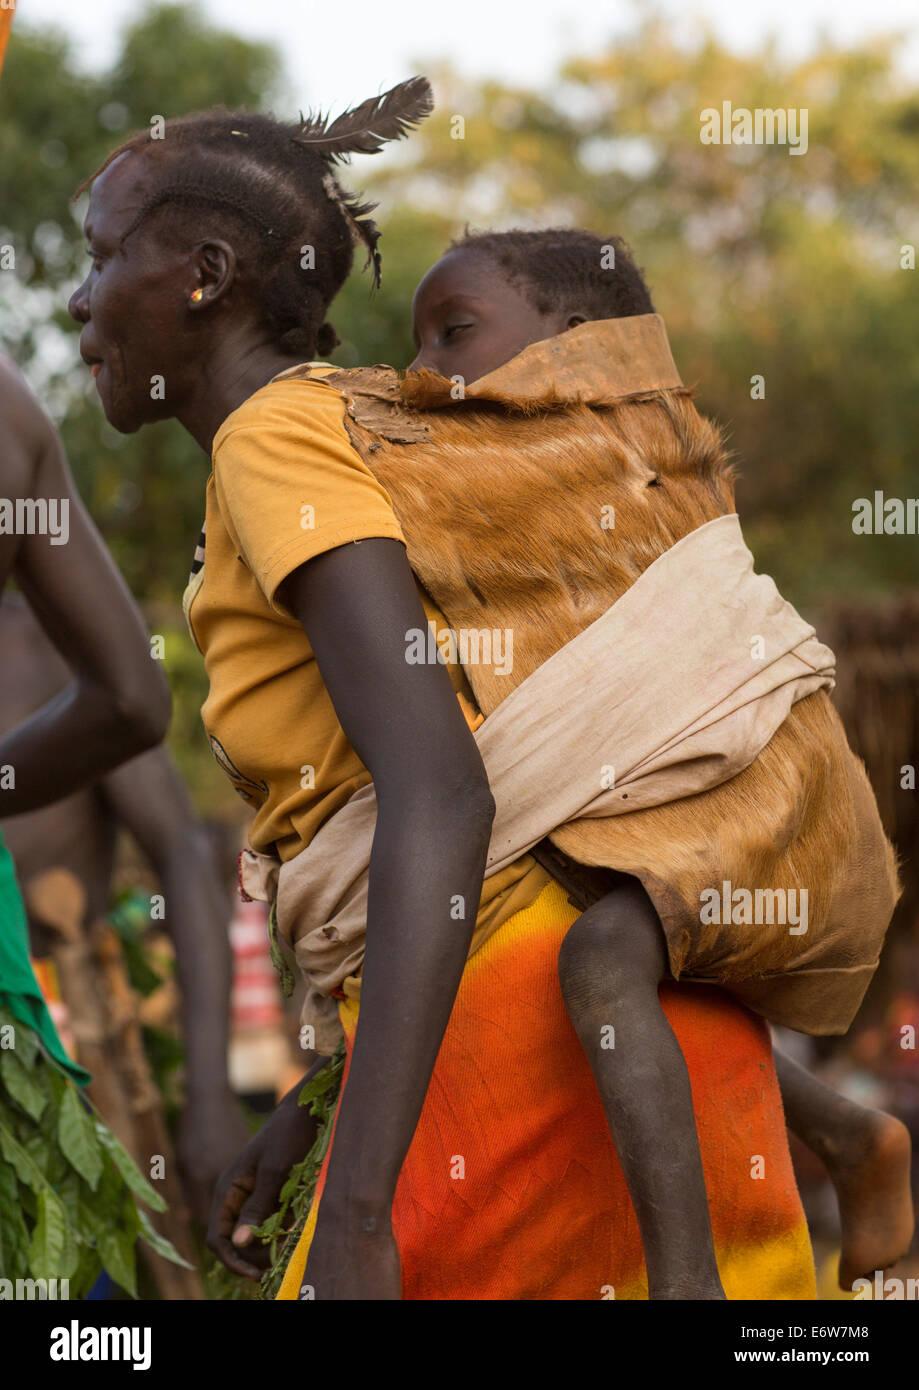 Majang Stamm Frau mit ihrem Baby, Kobown, Äthiopien Stockfoto